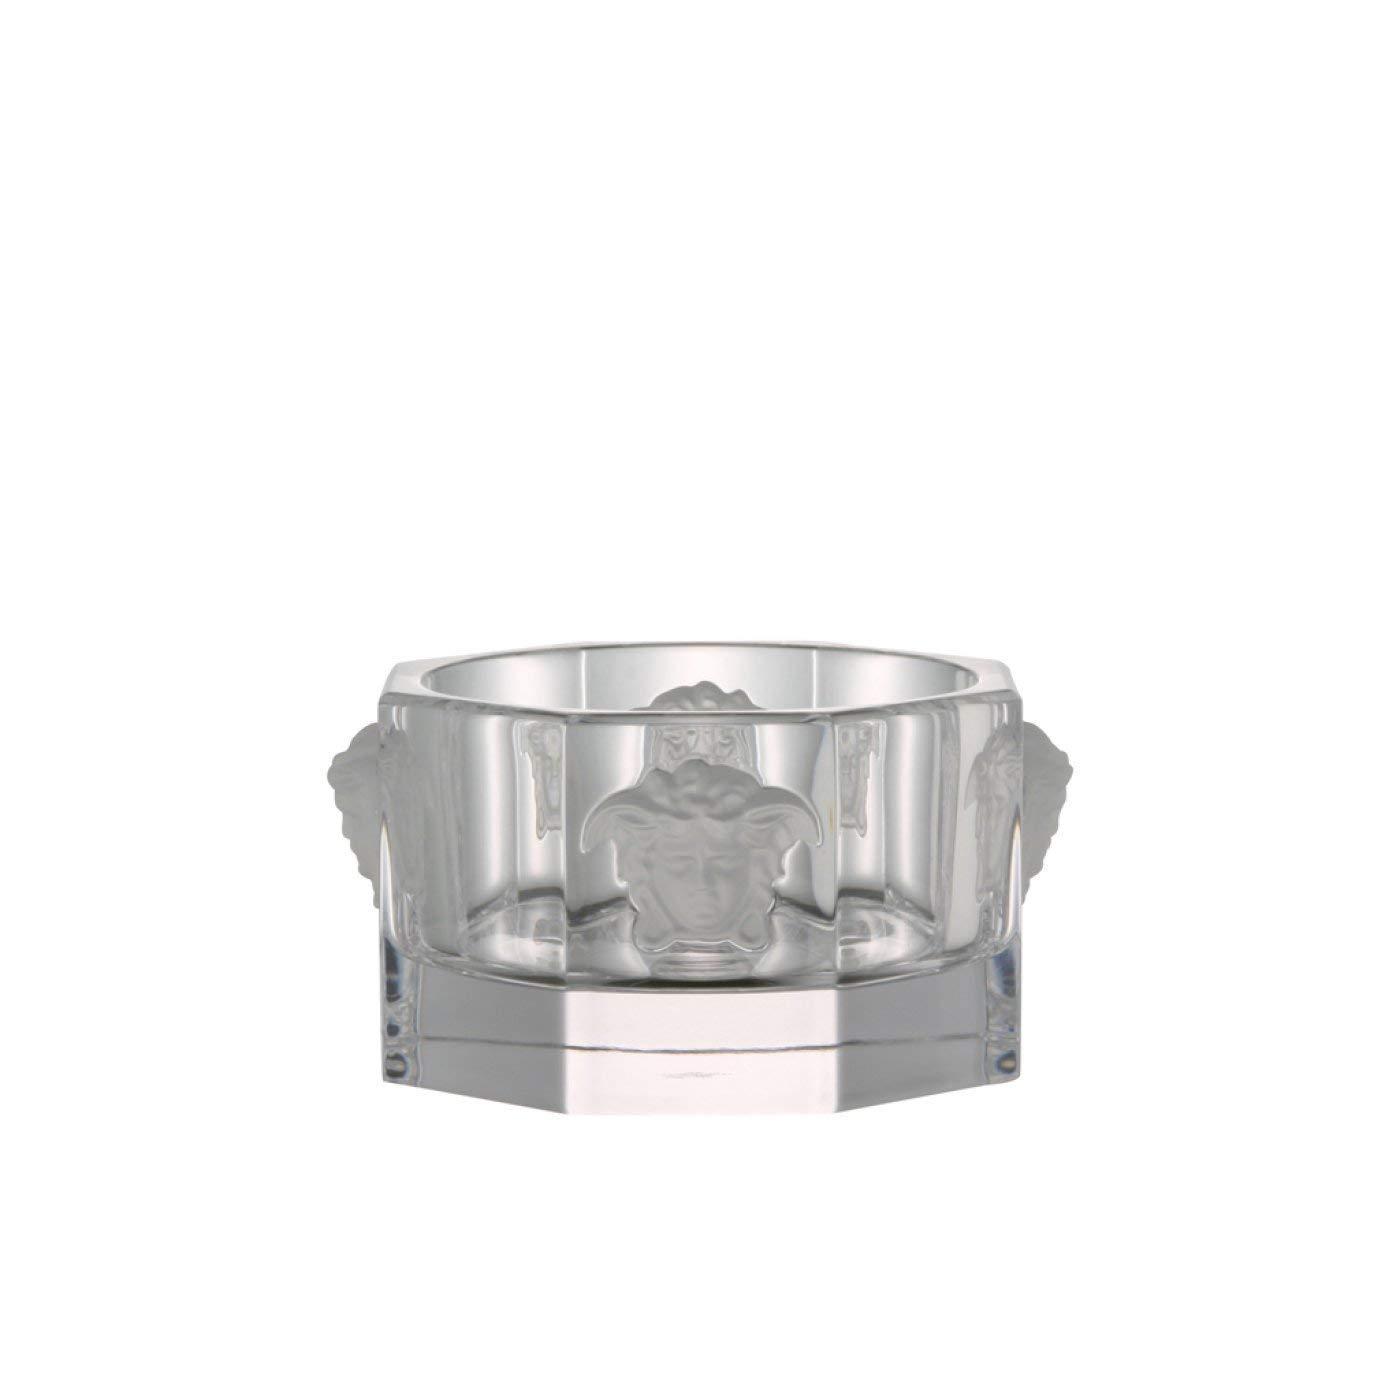 Rosenthal Versace Bottle Coaster Medusa Lumiere Luxurious Clear Crystal Coaster